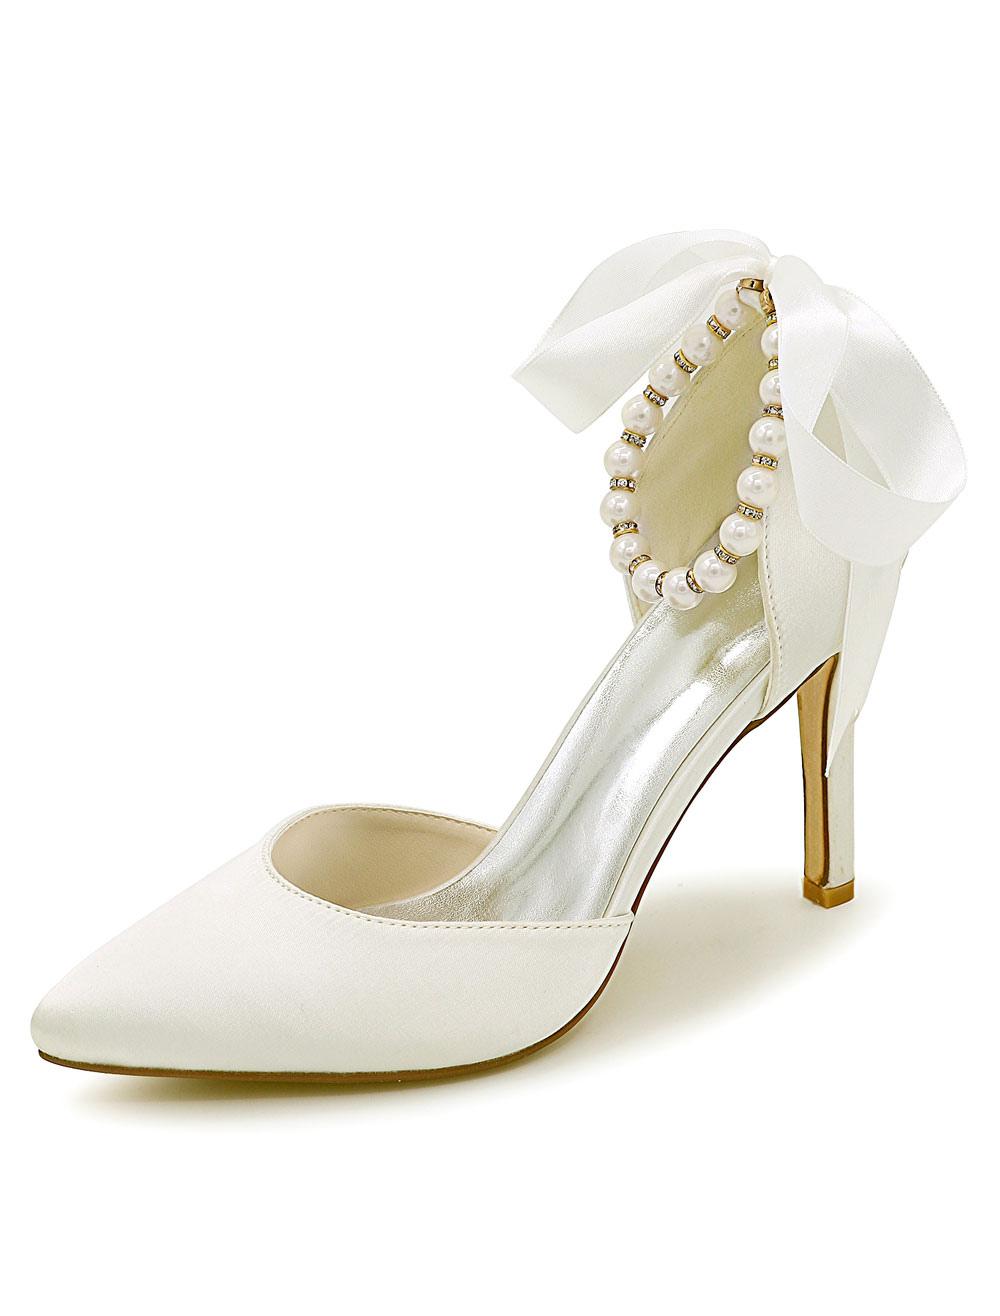 a48c196533acc Wedding Shoes | Bridal Shoes for Less | Milanoo.com